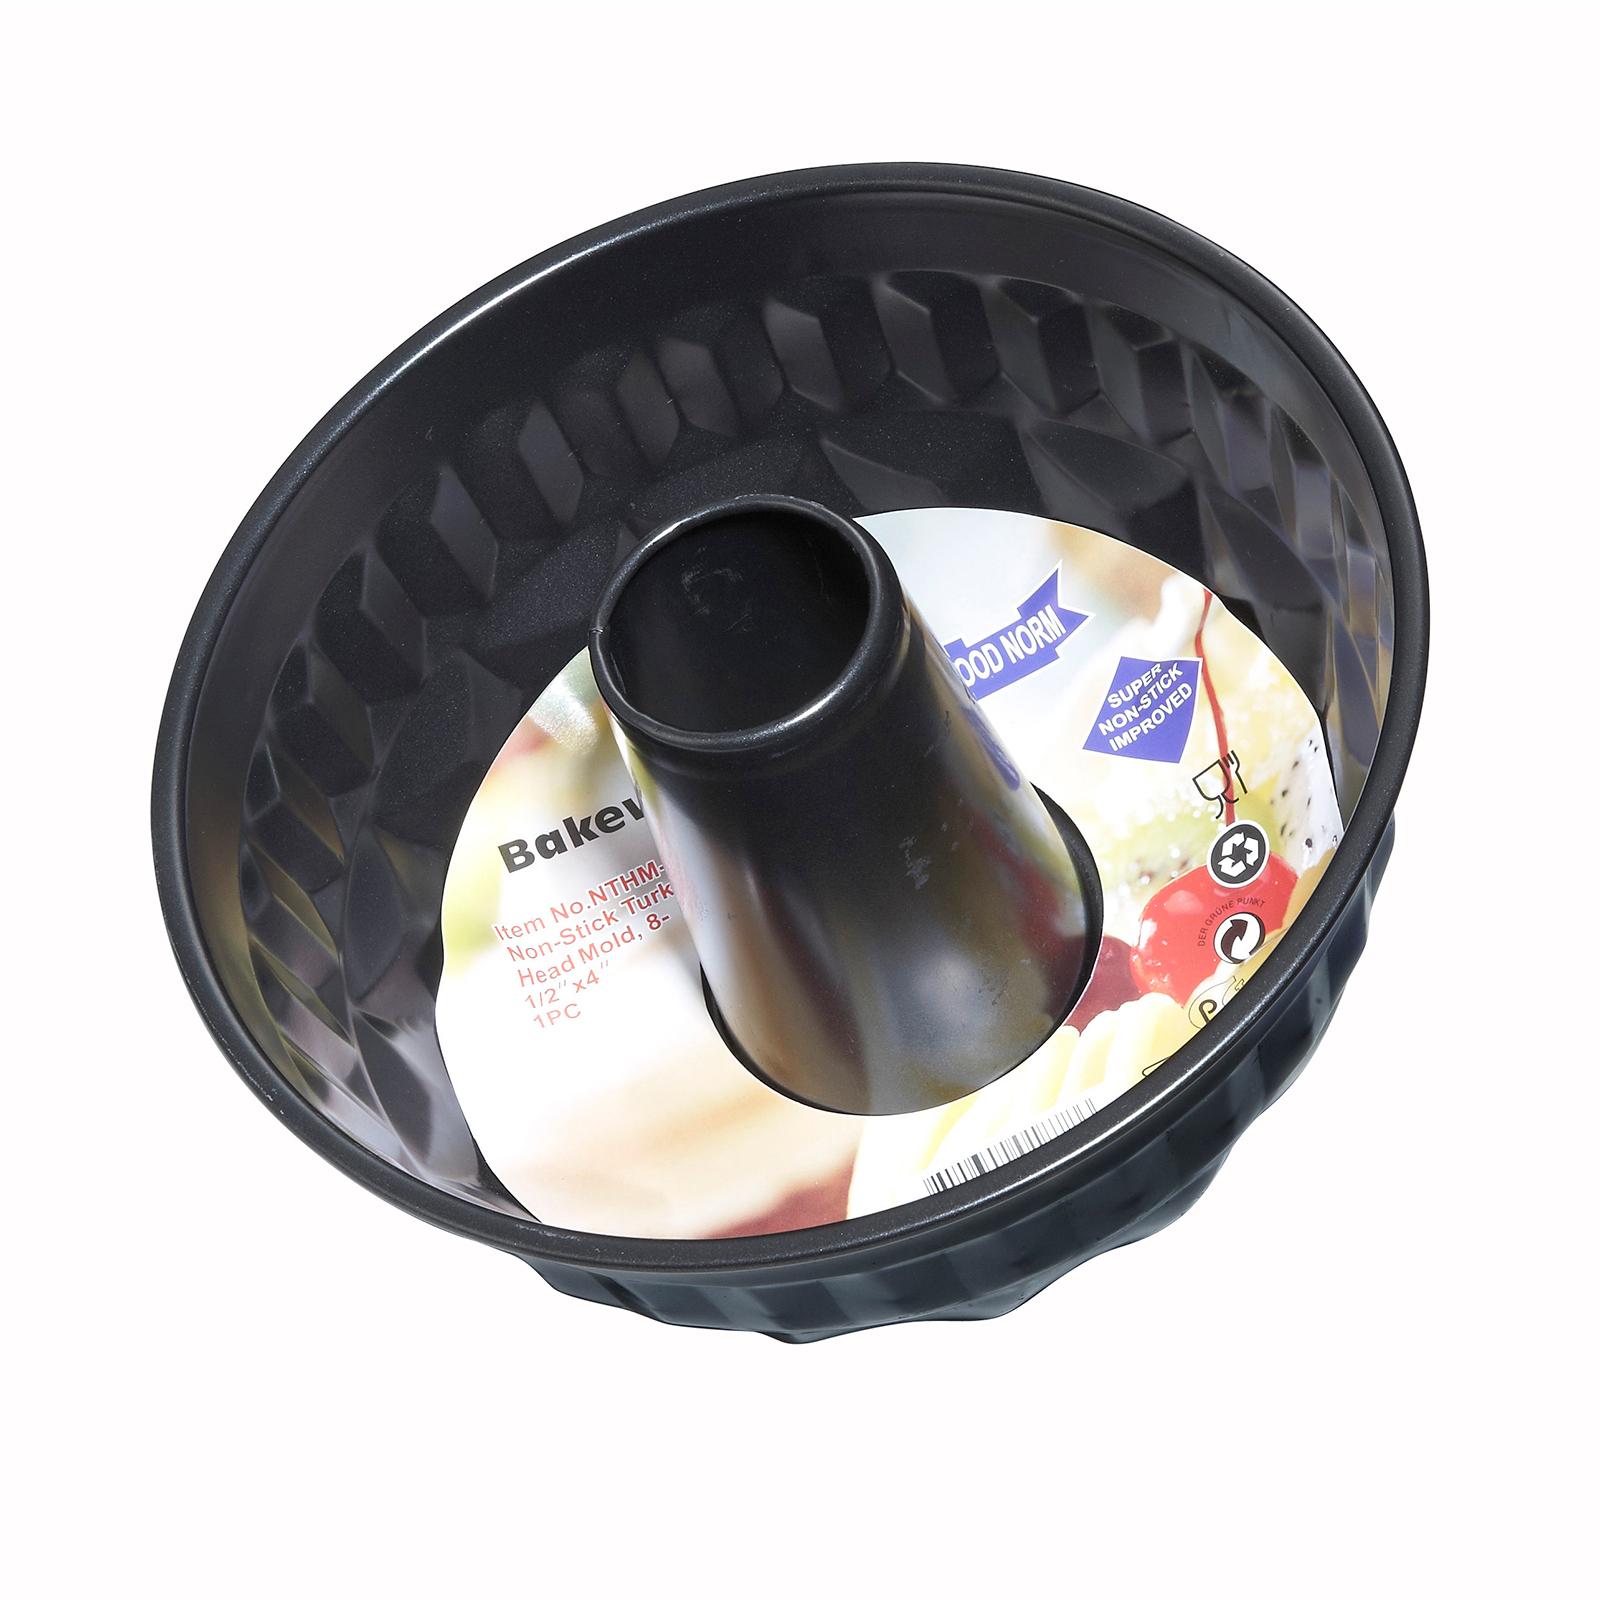 Winco NTHM-8 cake mold pan